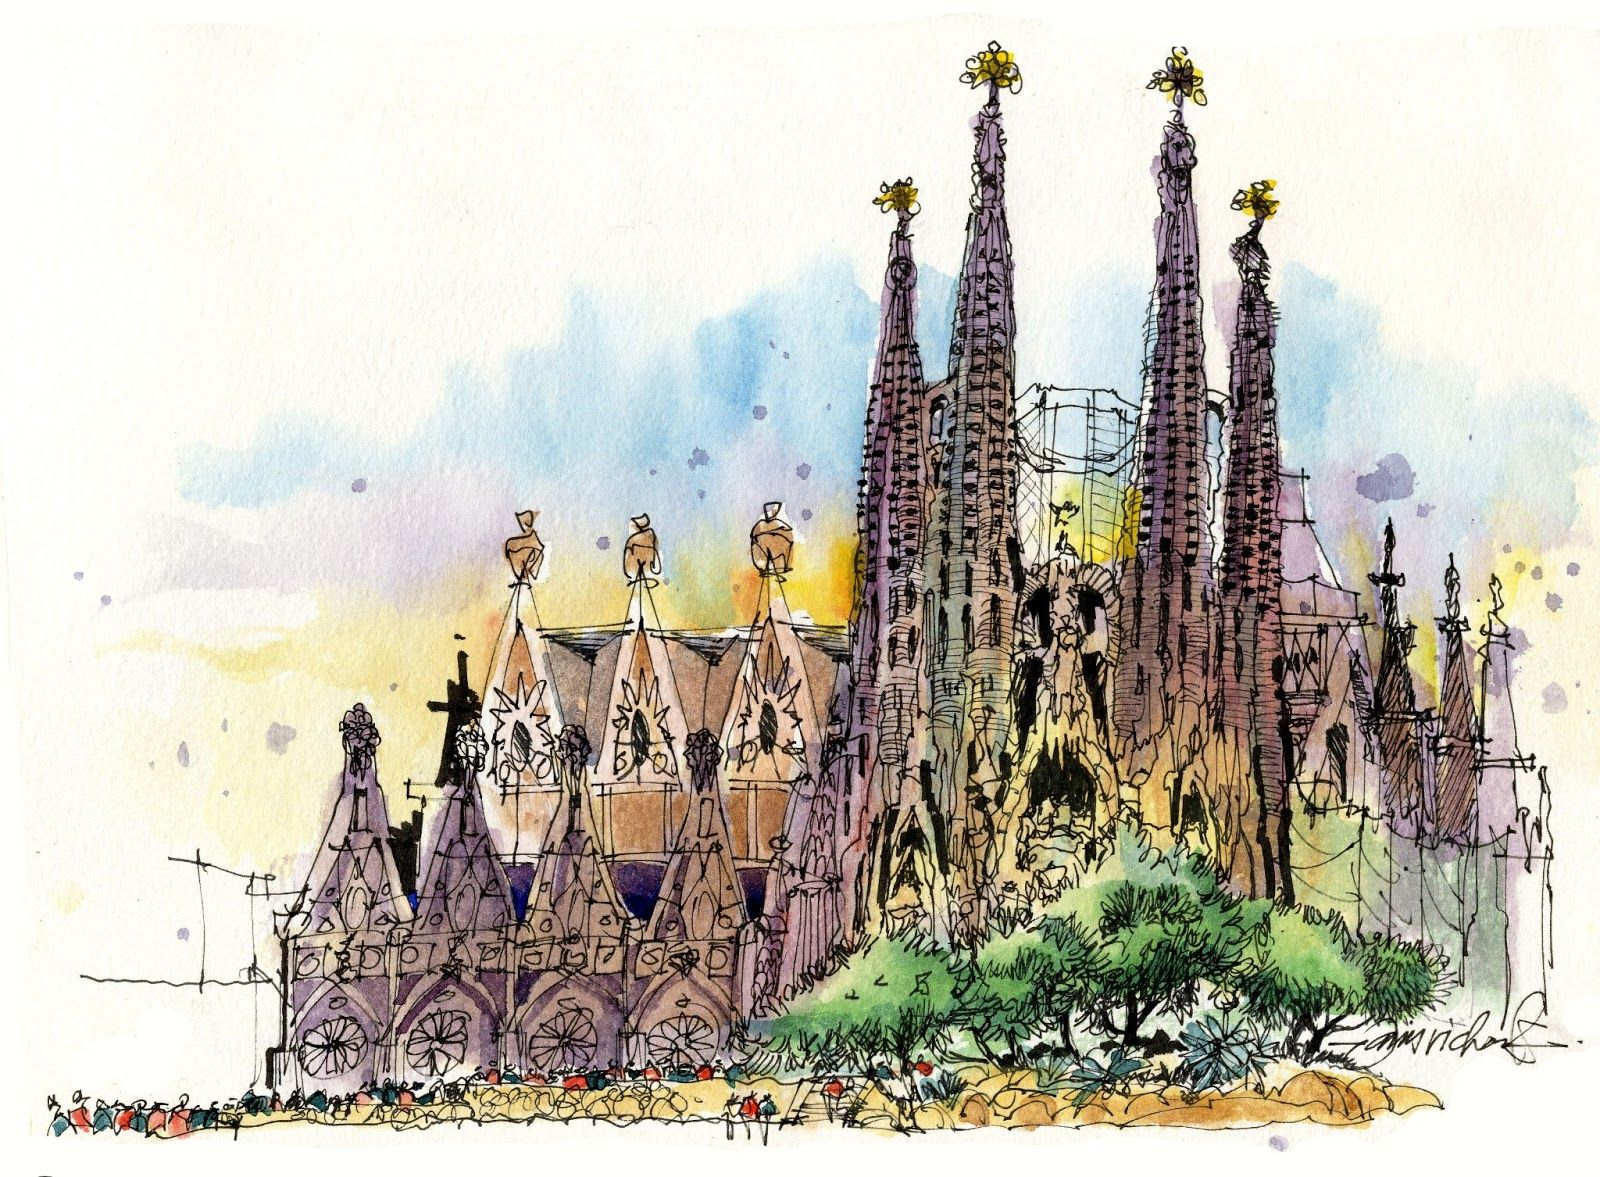 1600x1177 James Richards Sketchbook Return From Barcelona! Water Colors